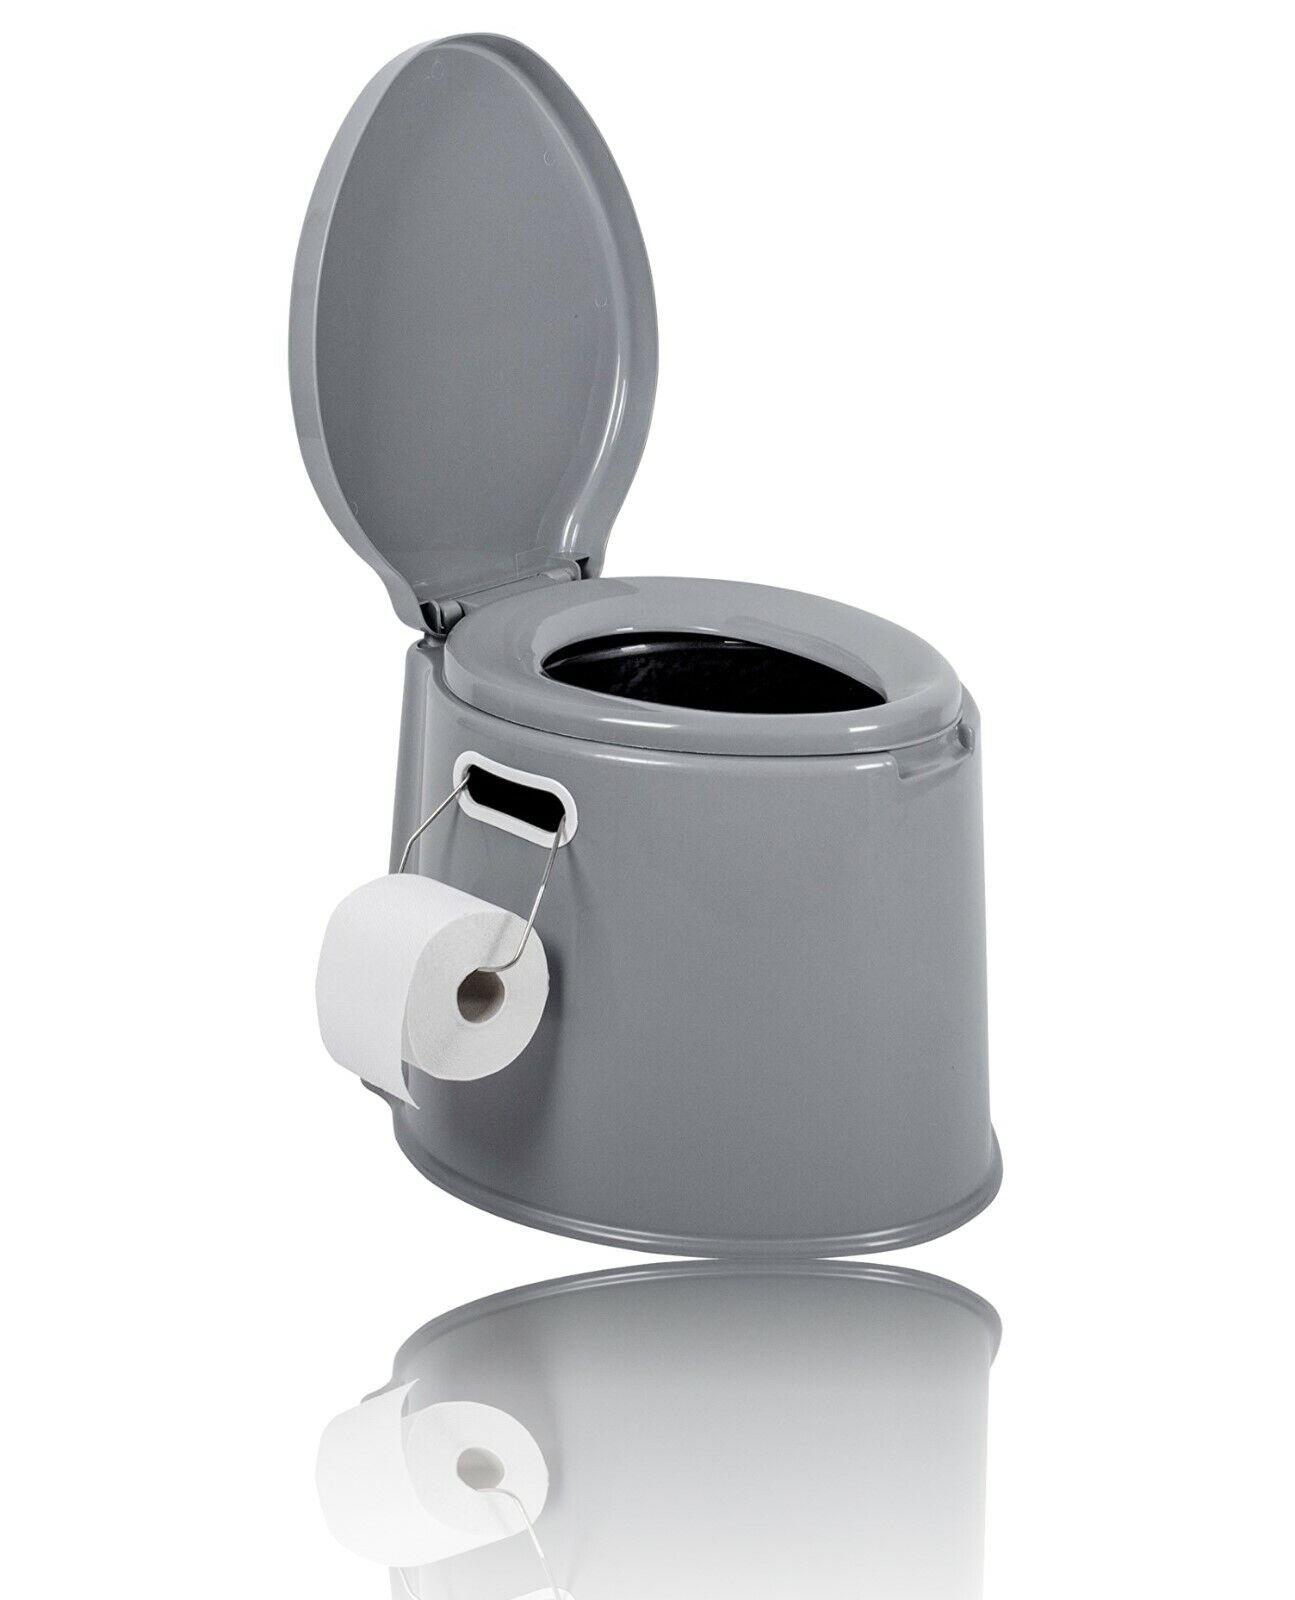 WC Reise Eimer Toilette Campingtoilette für Mobilehome Toiletteneimer [ Grau ]